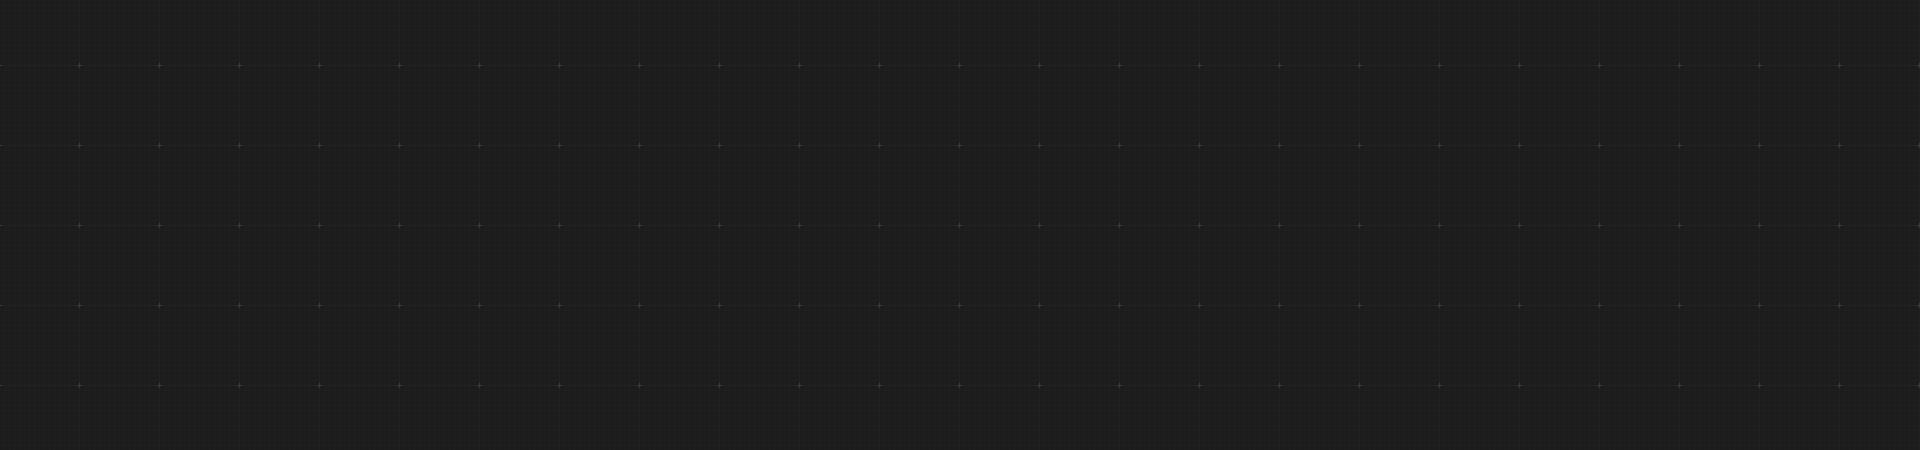 ff_rev_slider_bkg_graphy_dark